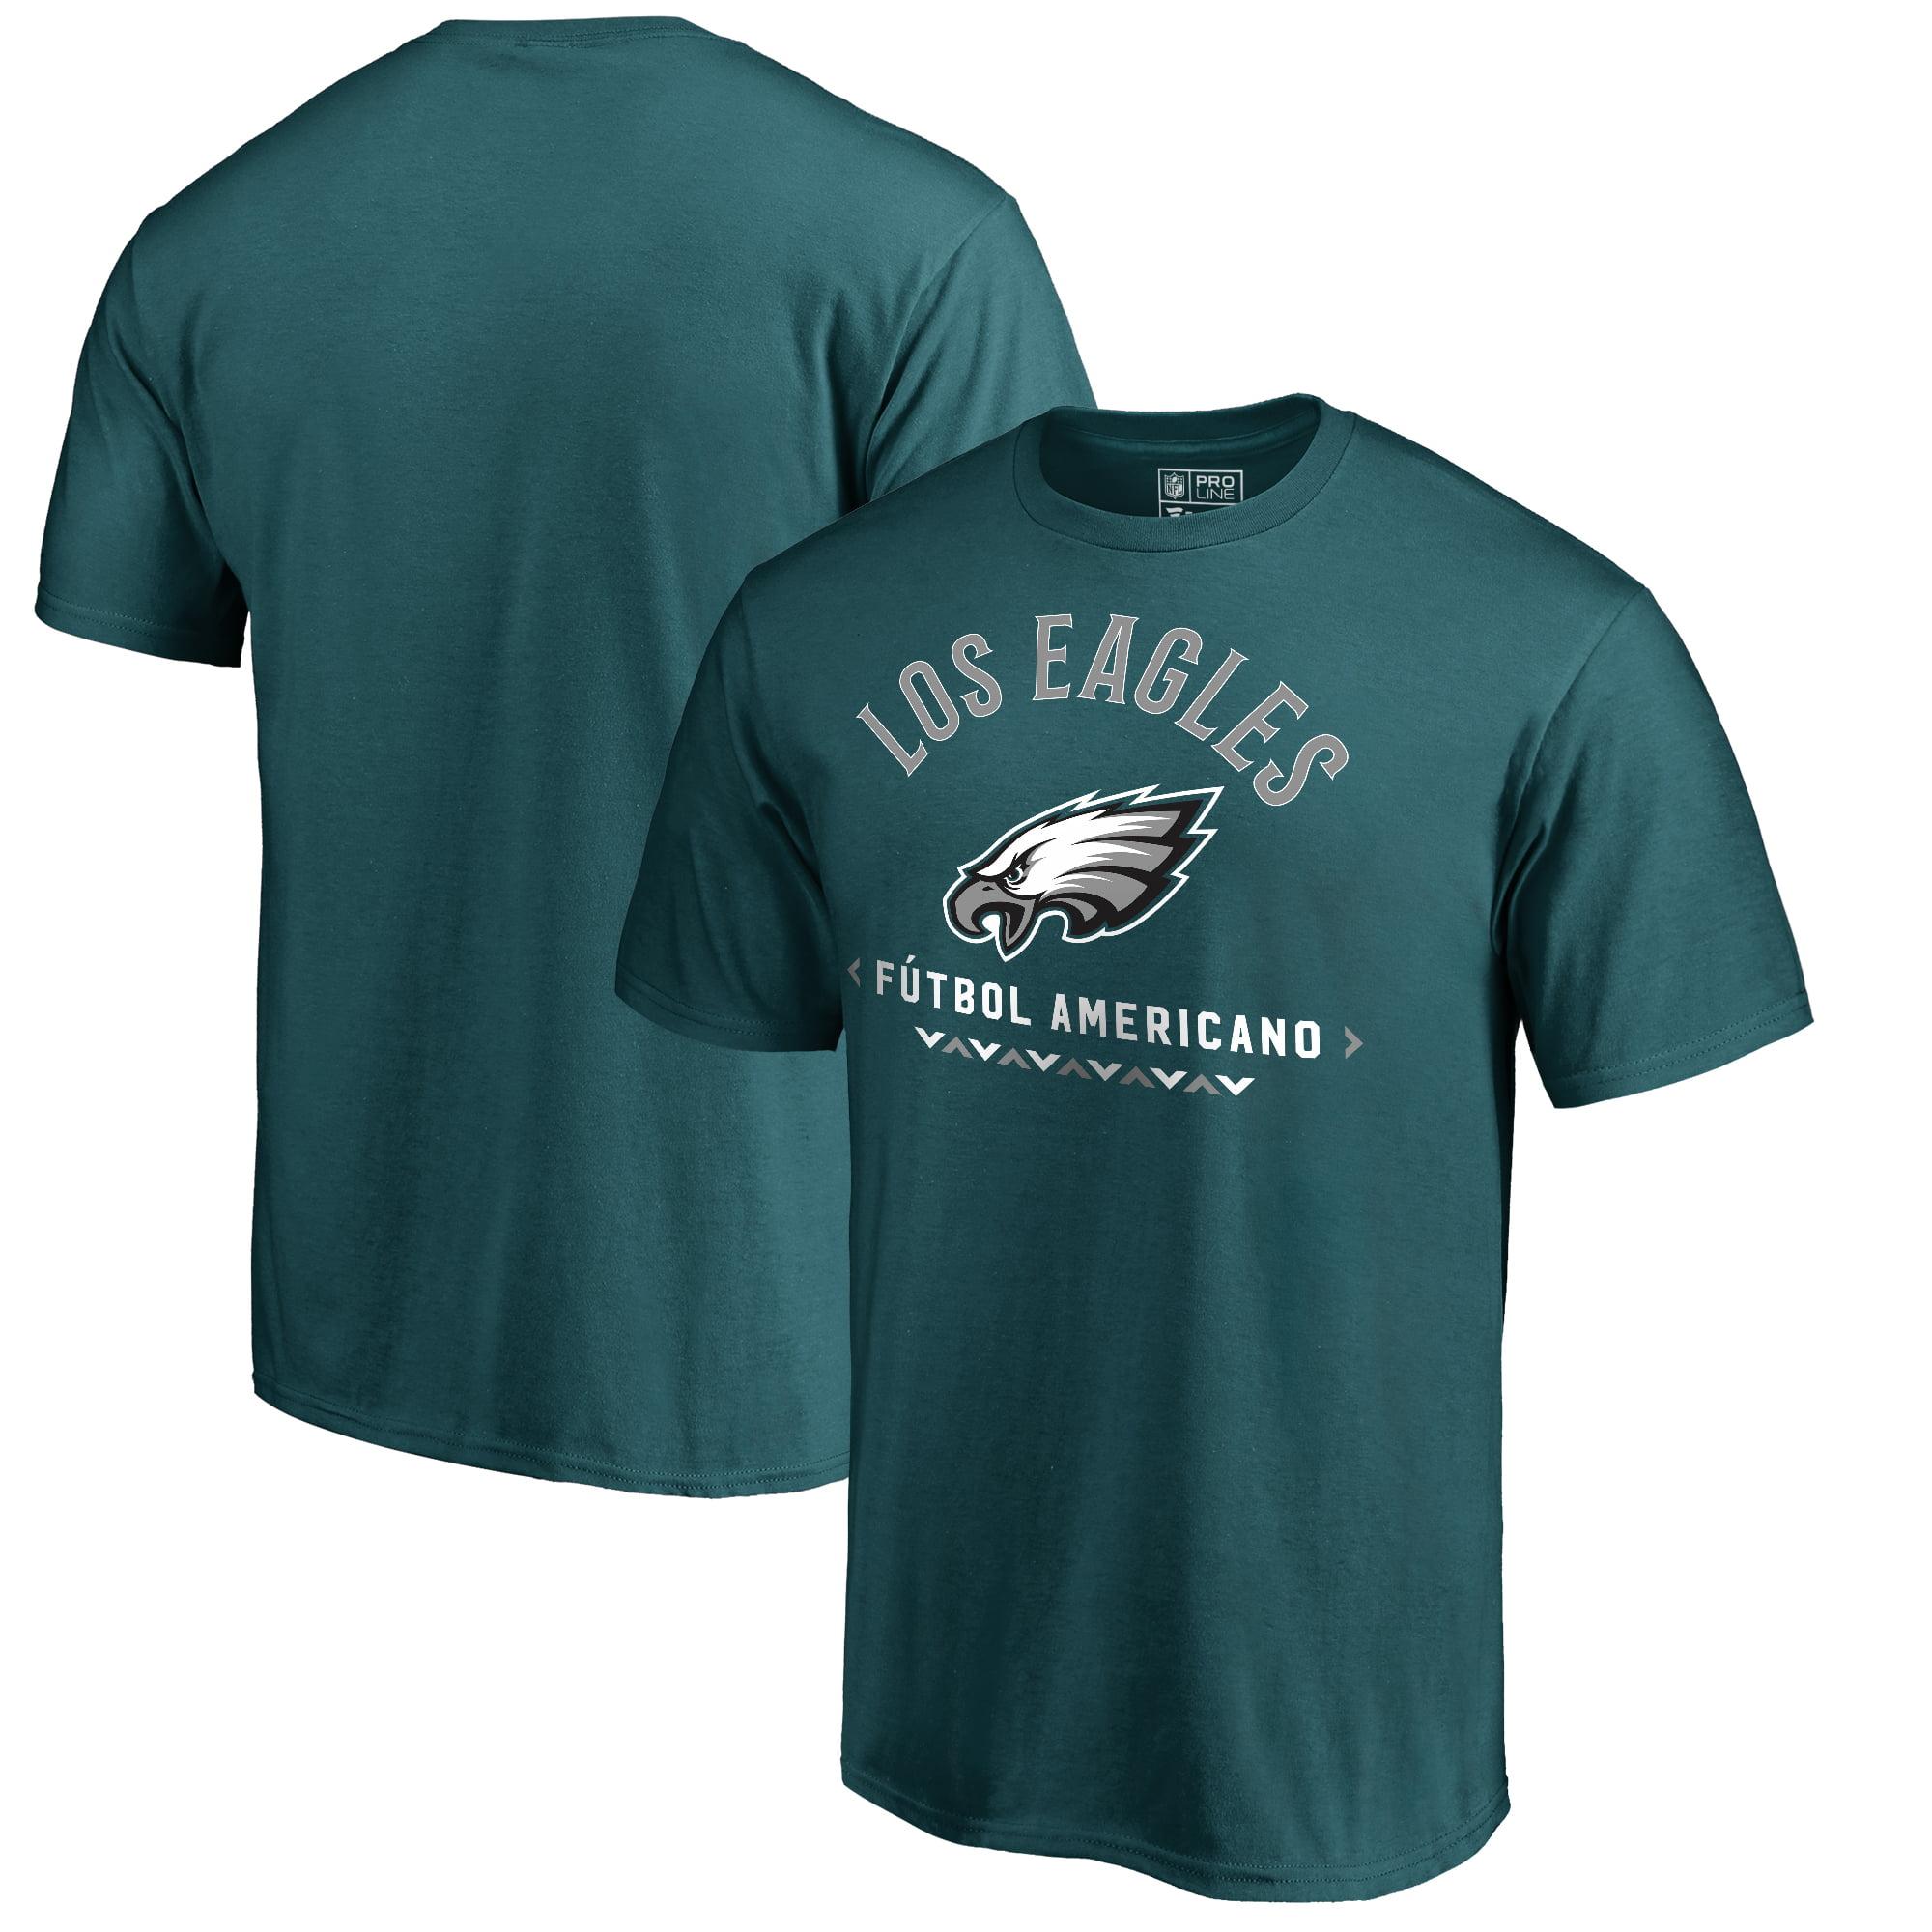 Philadelphia Eagles NFL Pro Line by Fanatics Branded Futbol Americano T-Shirt - Midnight Green